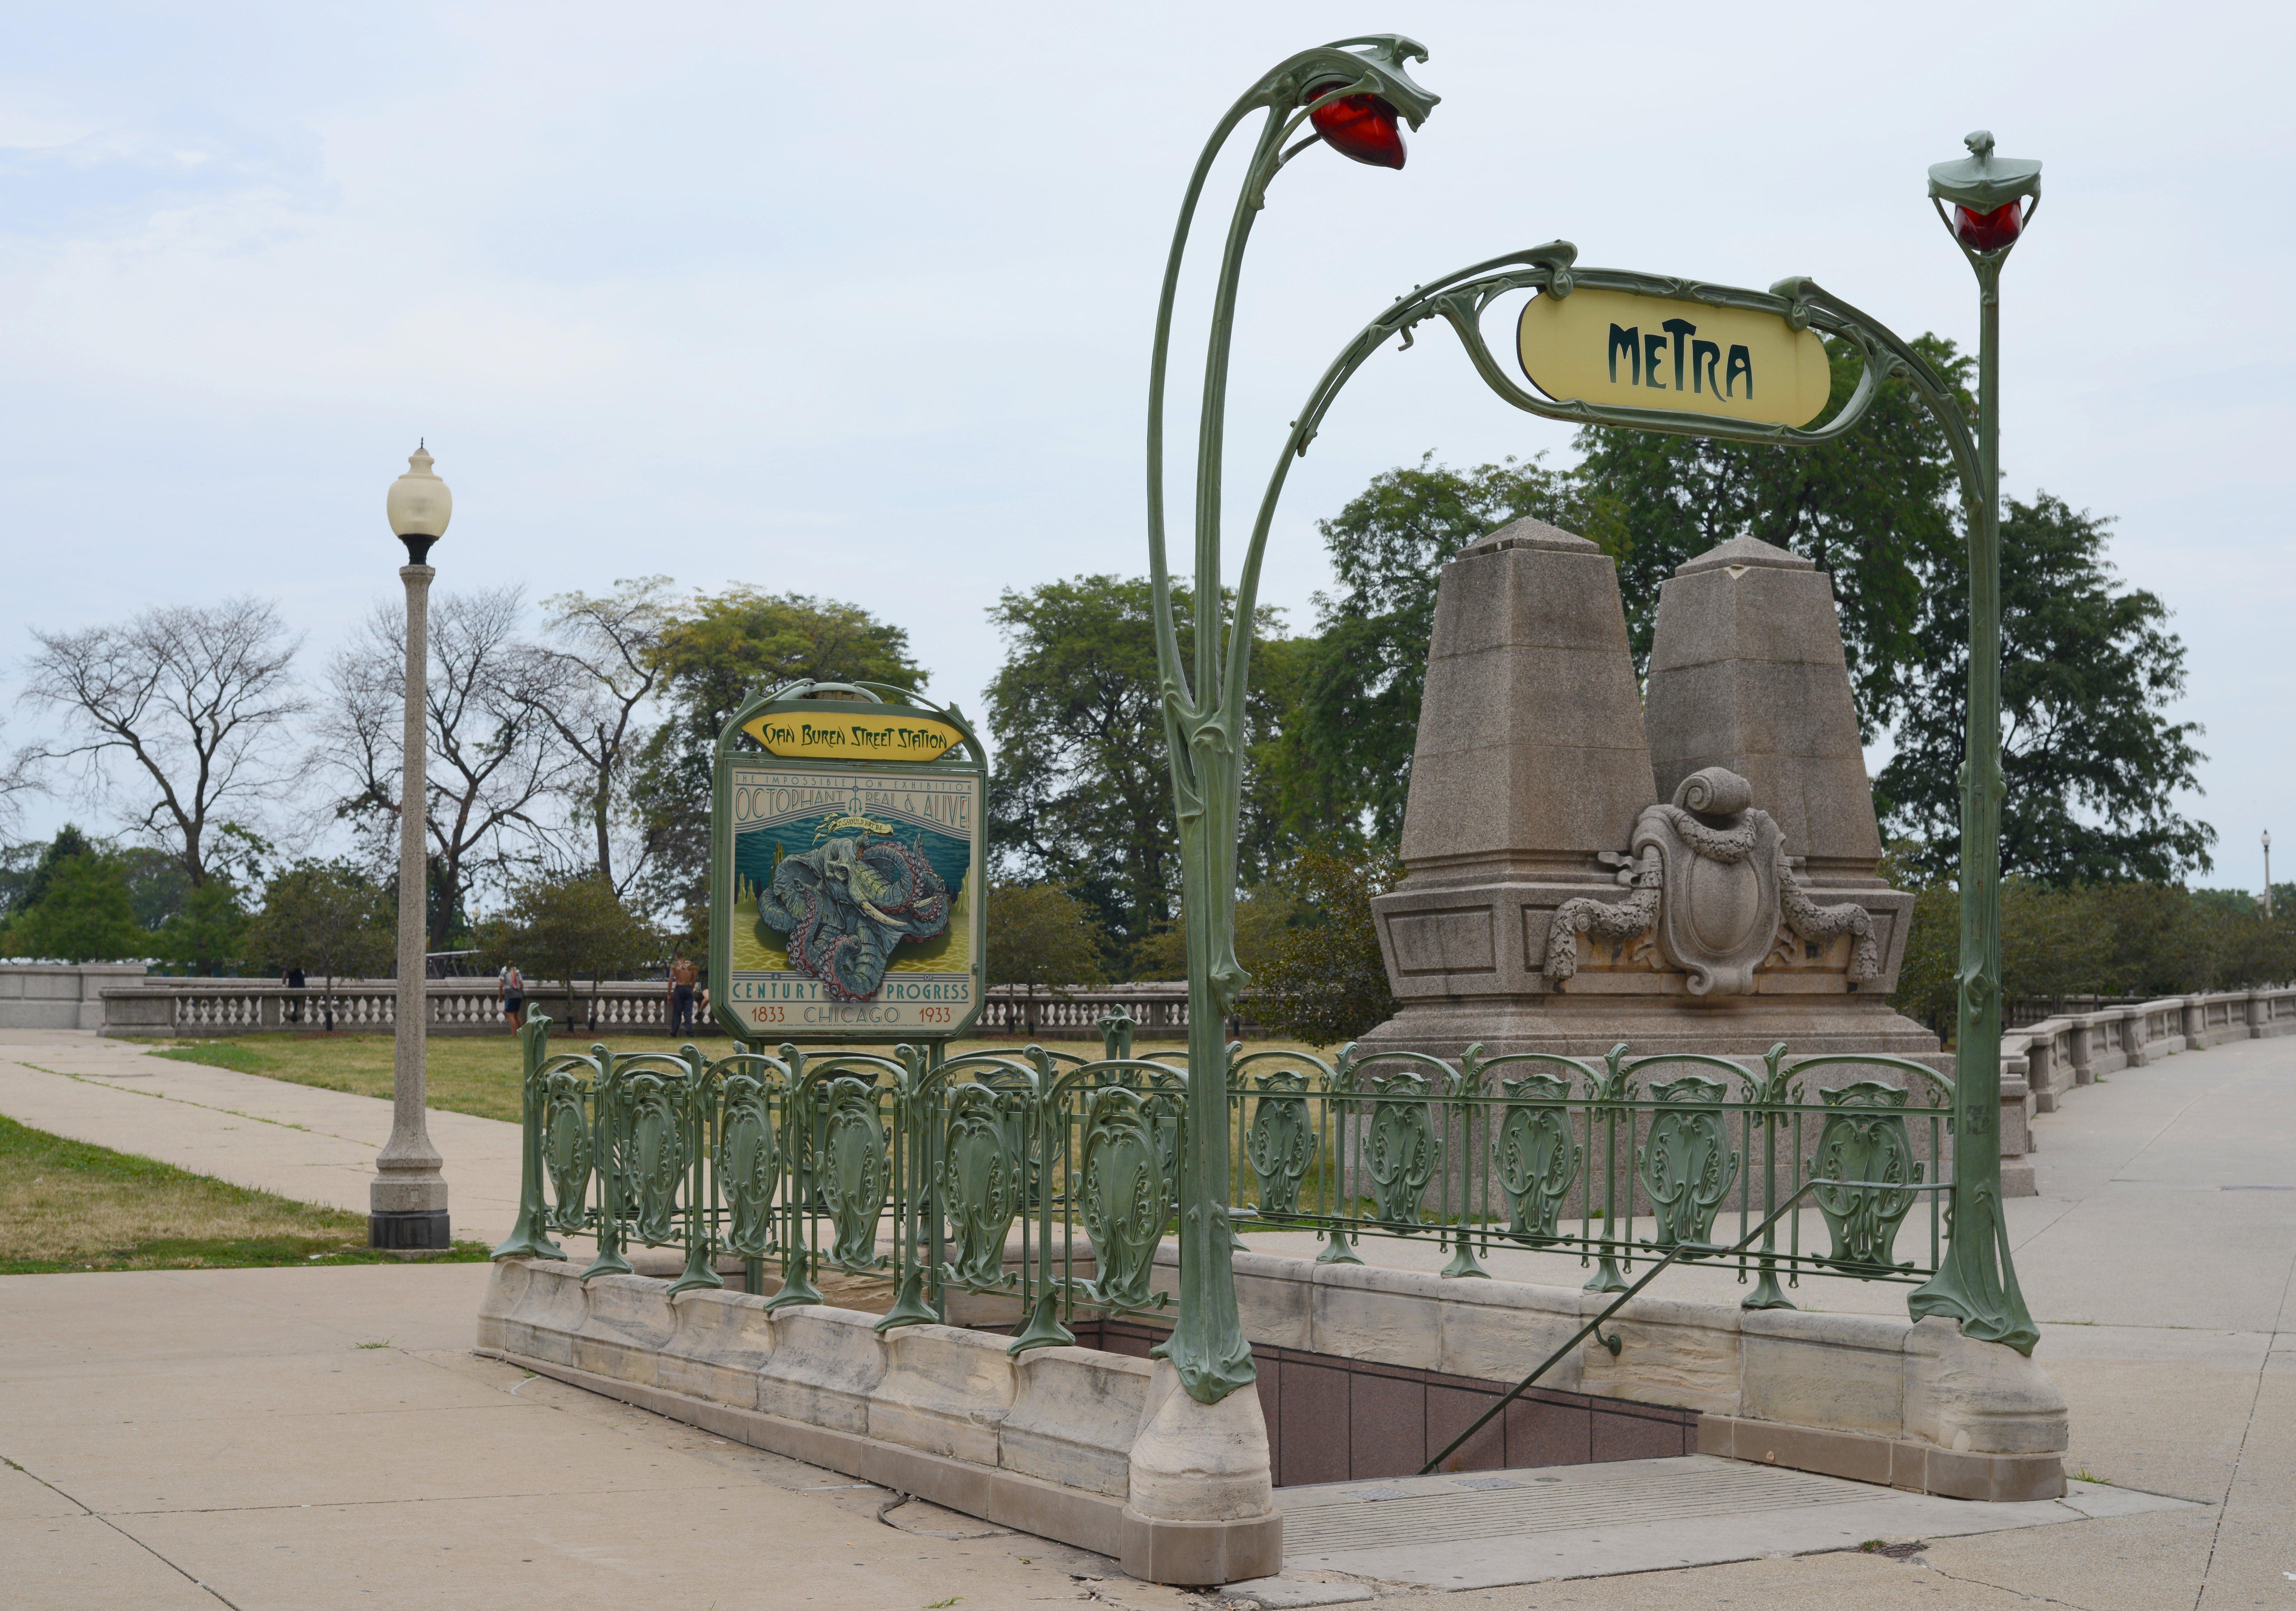 File:2012-07-21 7000x4912 chicago art nouveau metra.jpg - Wikipedia